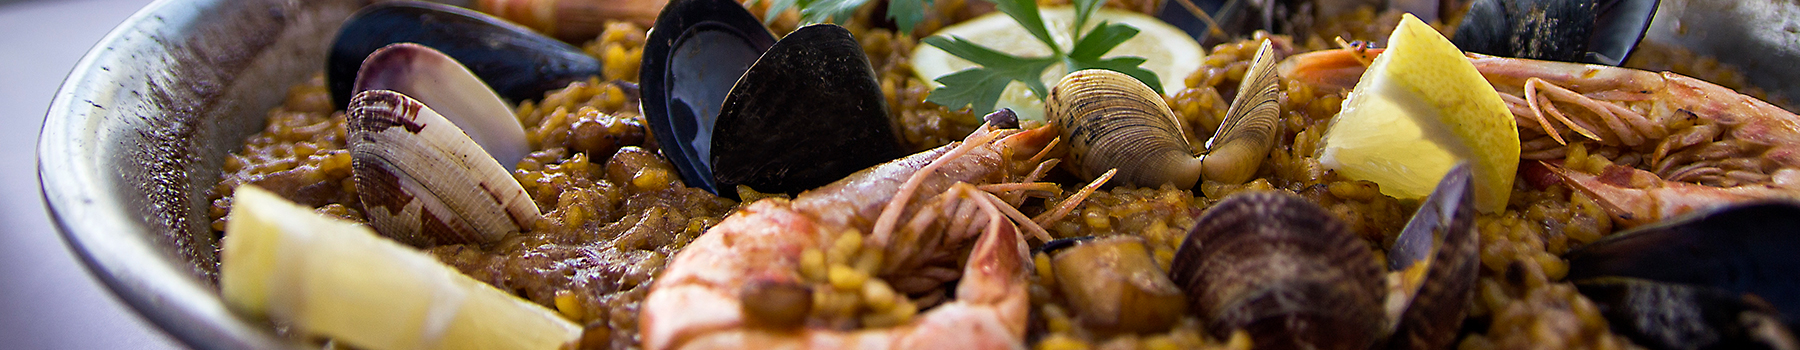 Feste und Gastronomie-Tage in l'Ampolla